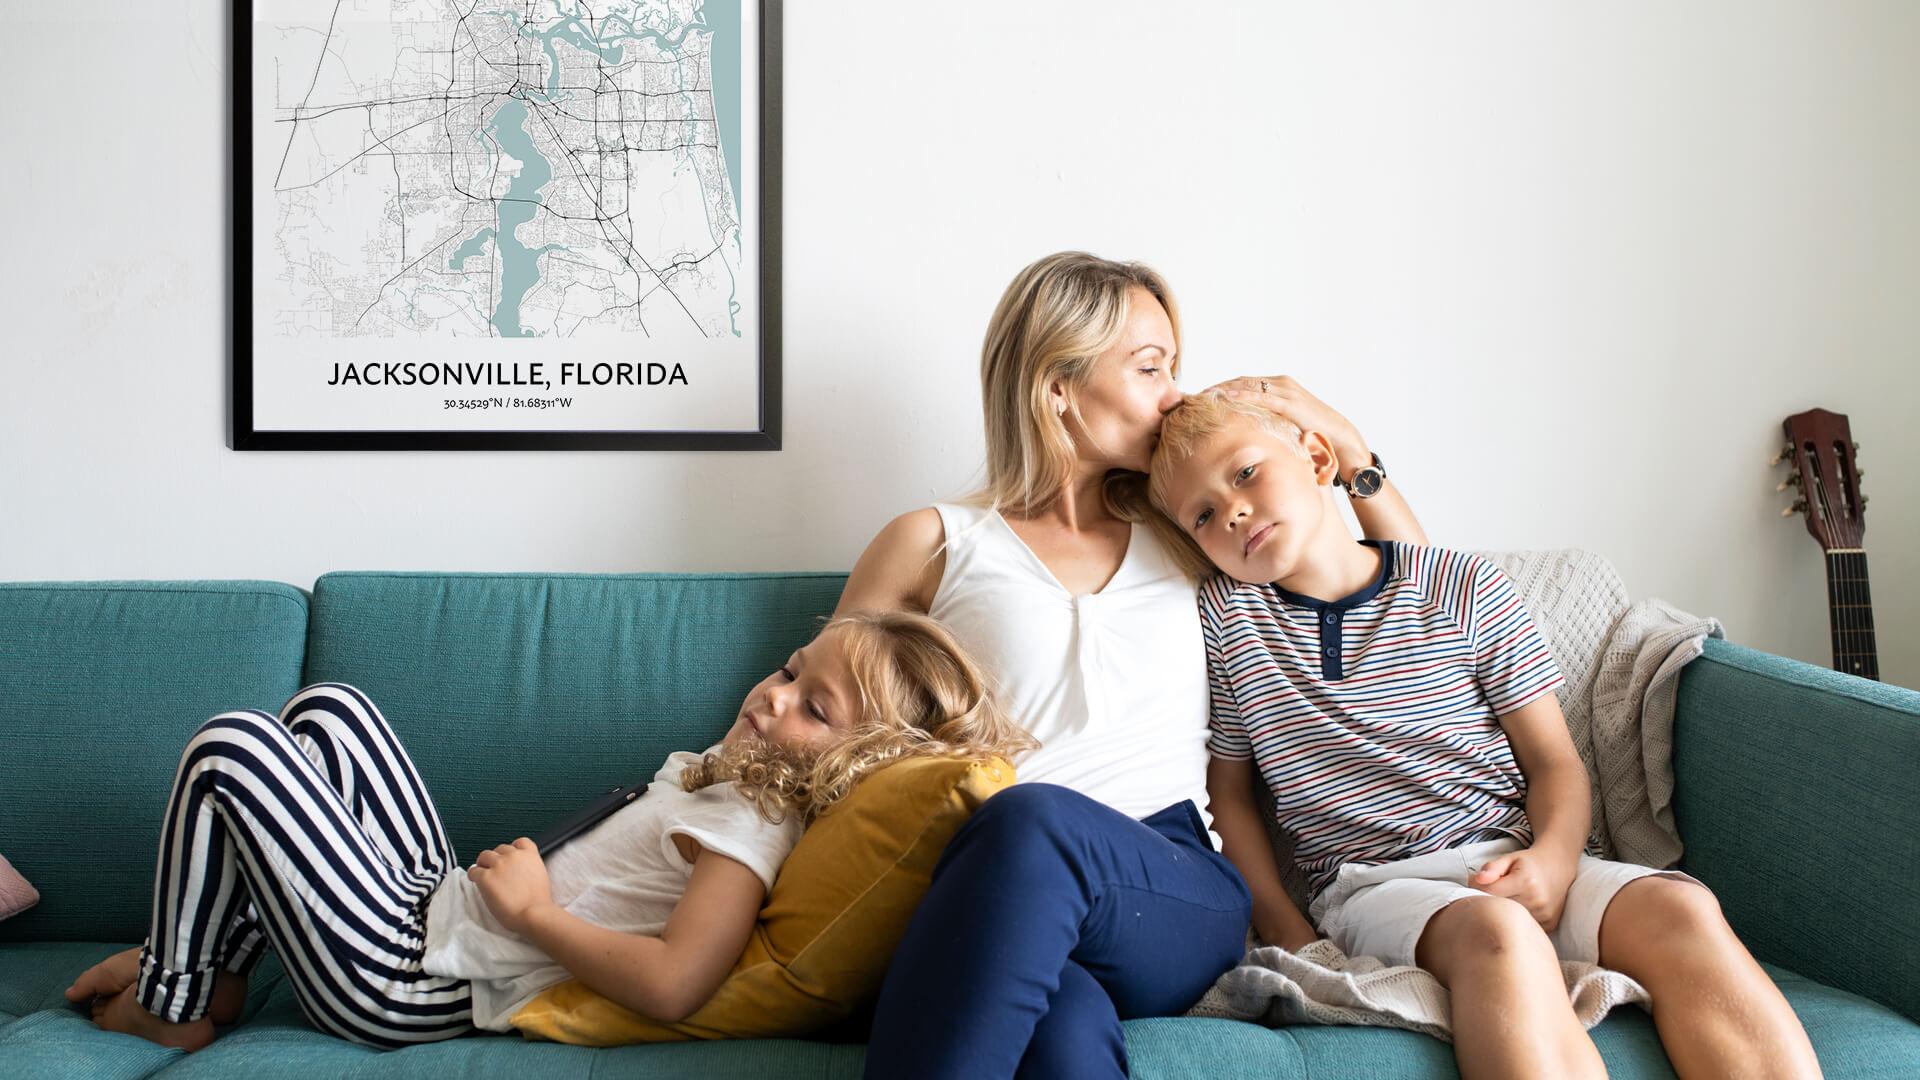 Jacksonville map poster